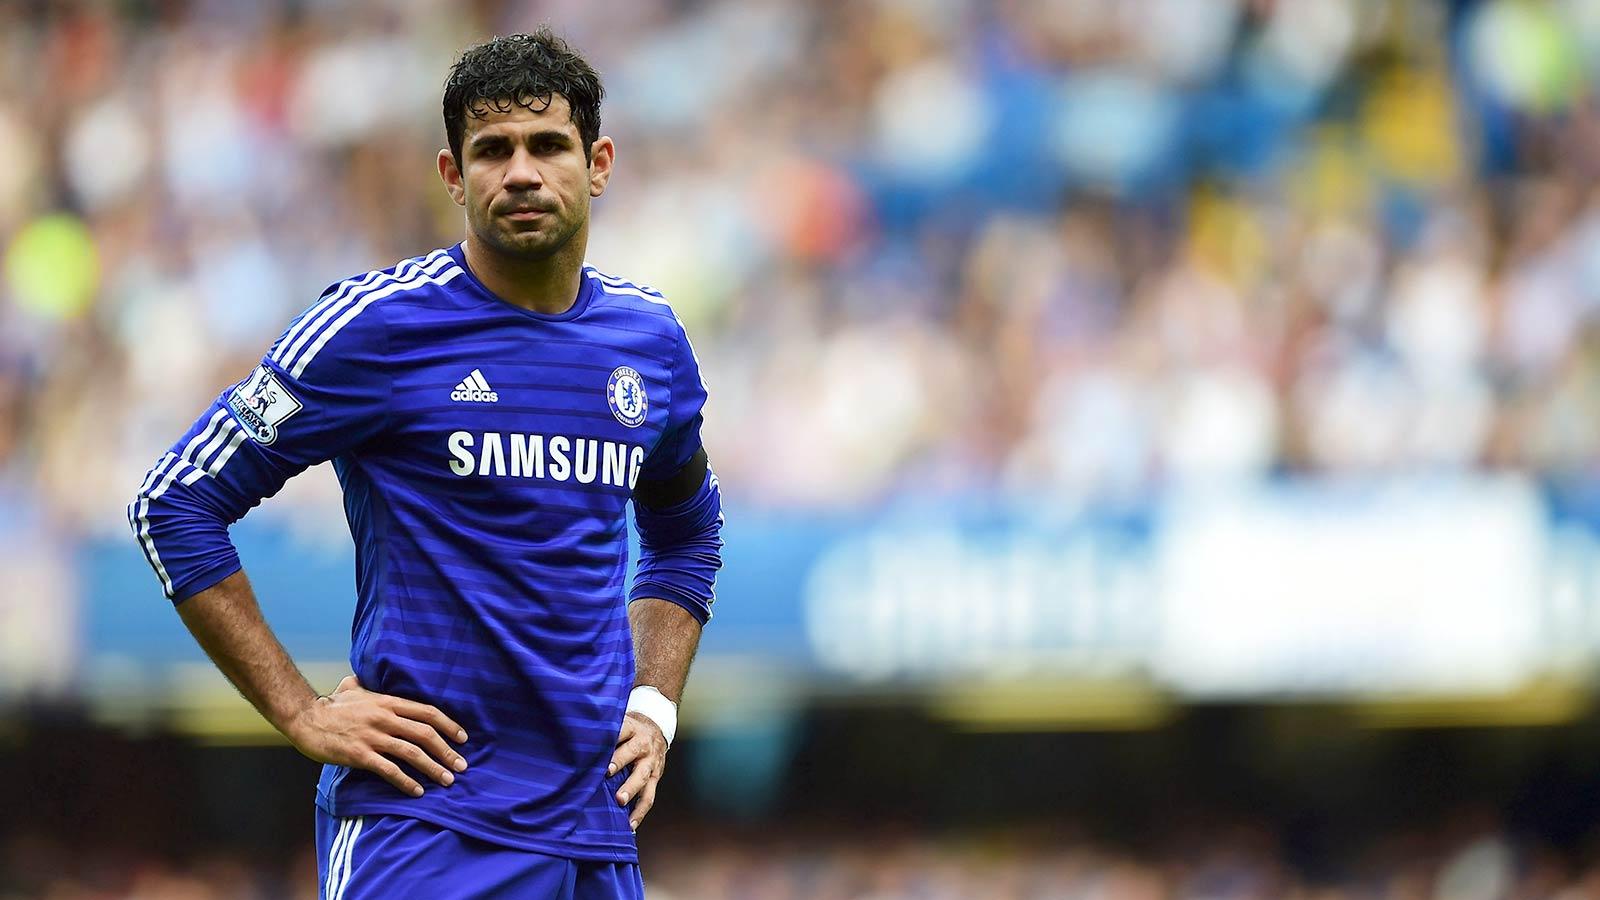 Kesan Diego Costa Selama Berseragam Chelsea